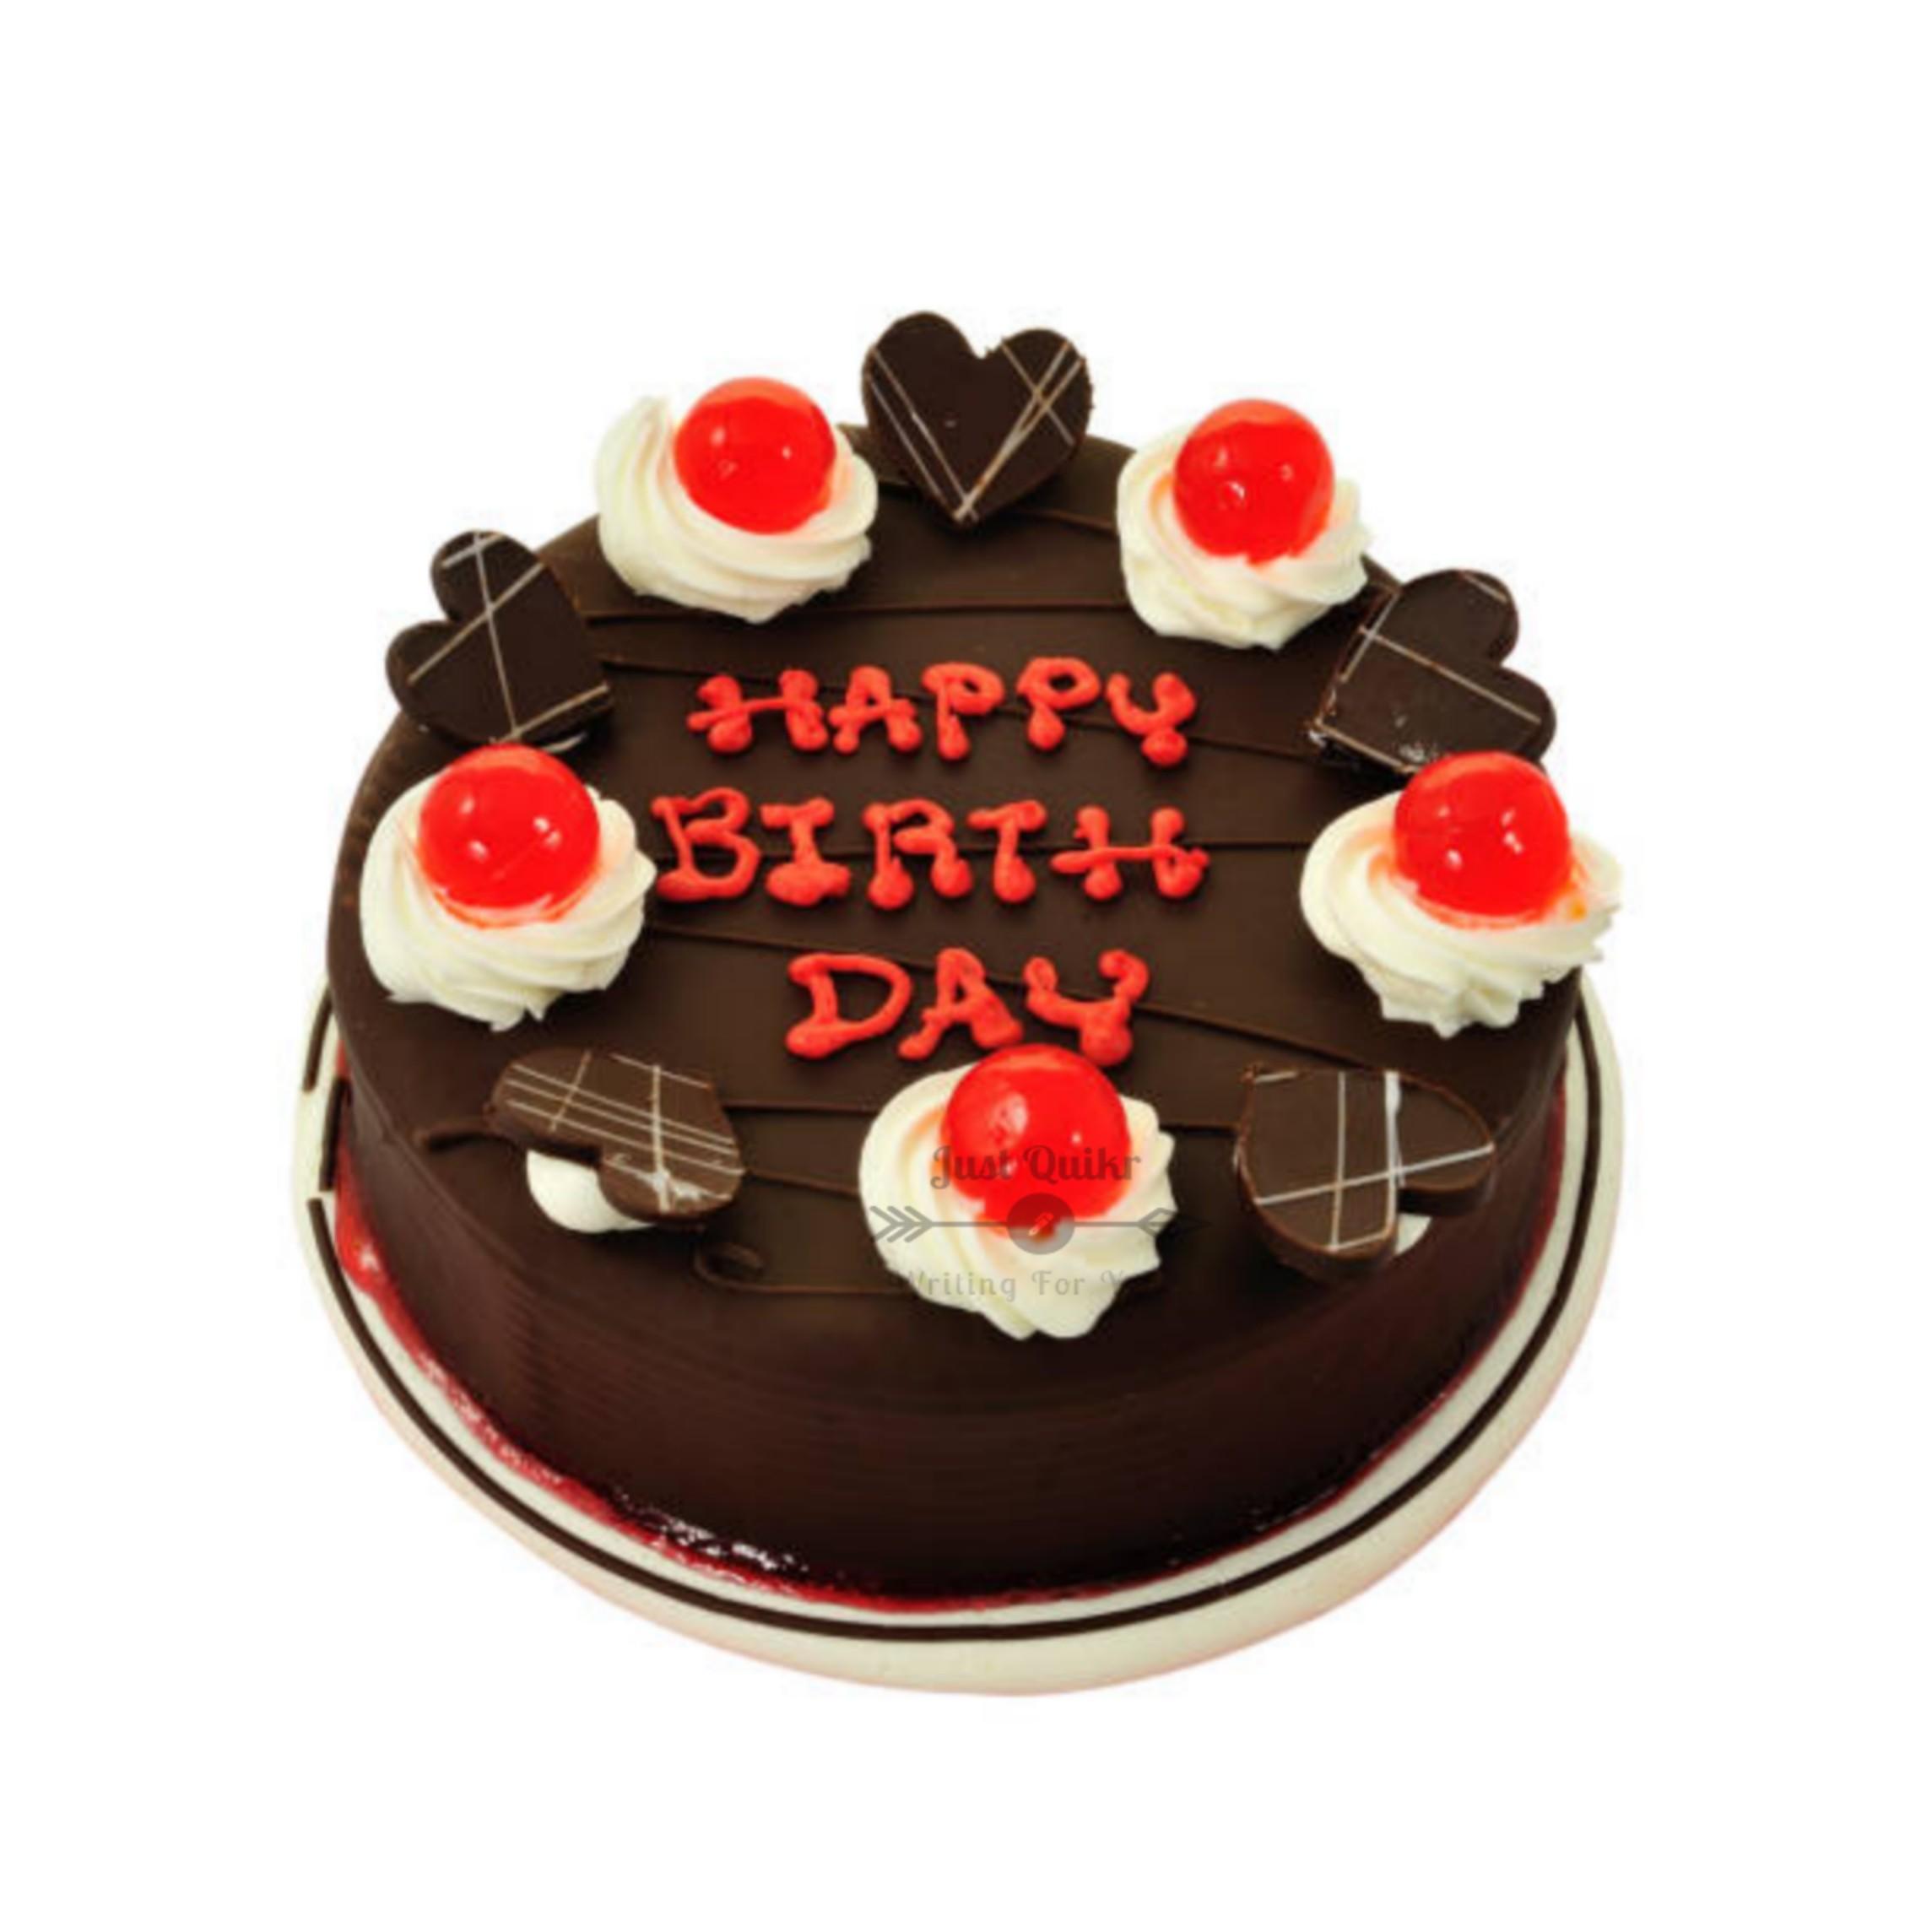 CreativeHappy Birthday Wishing Cake Status Images for Ex-BF